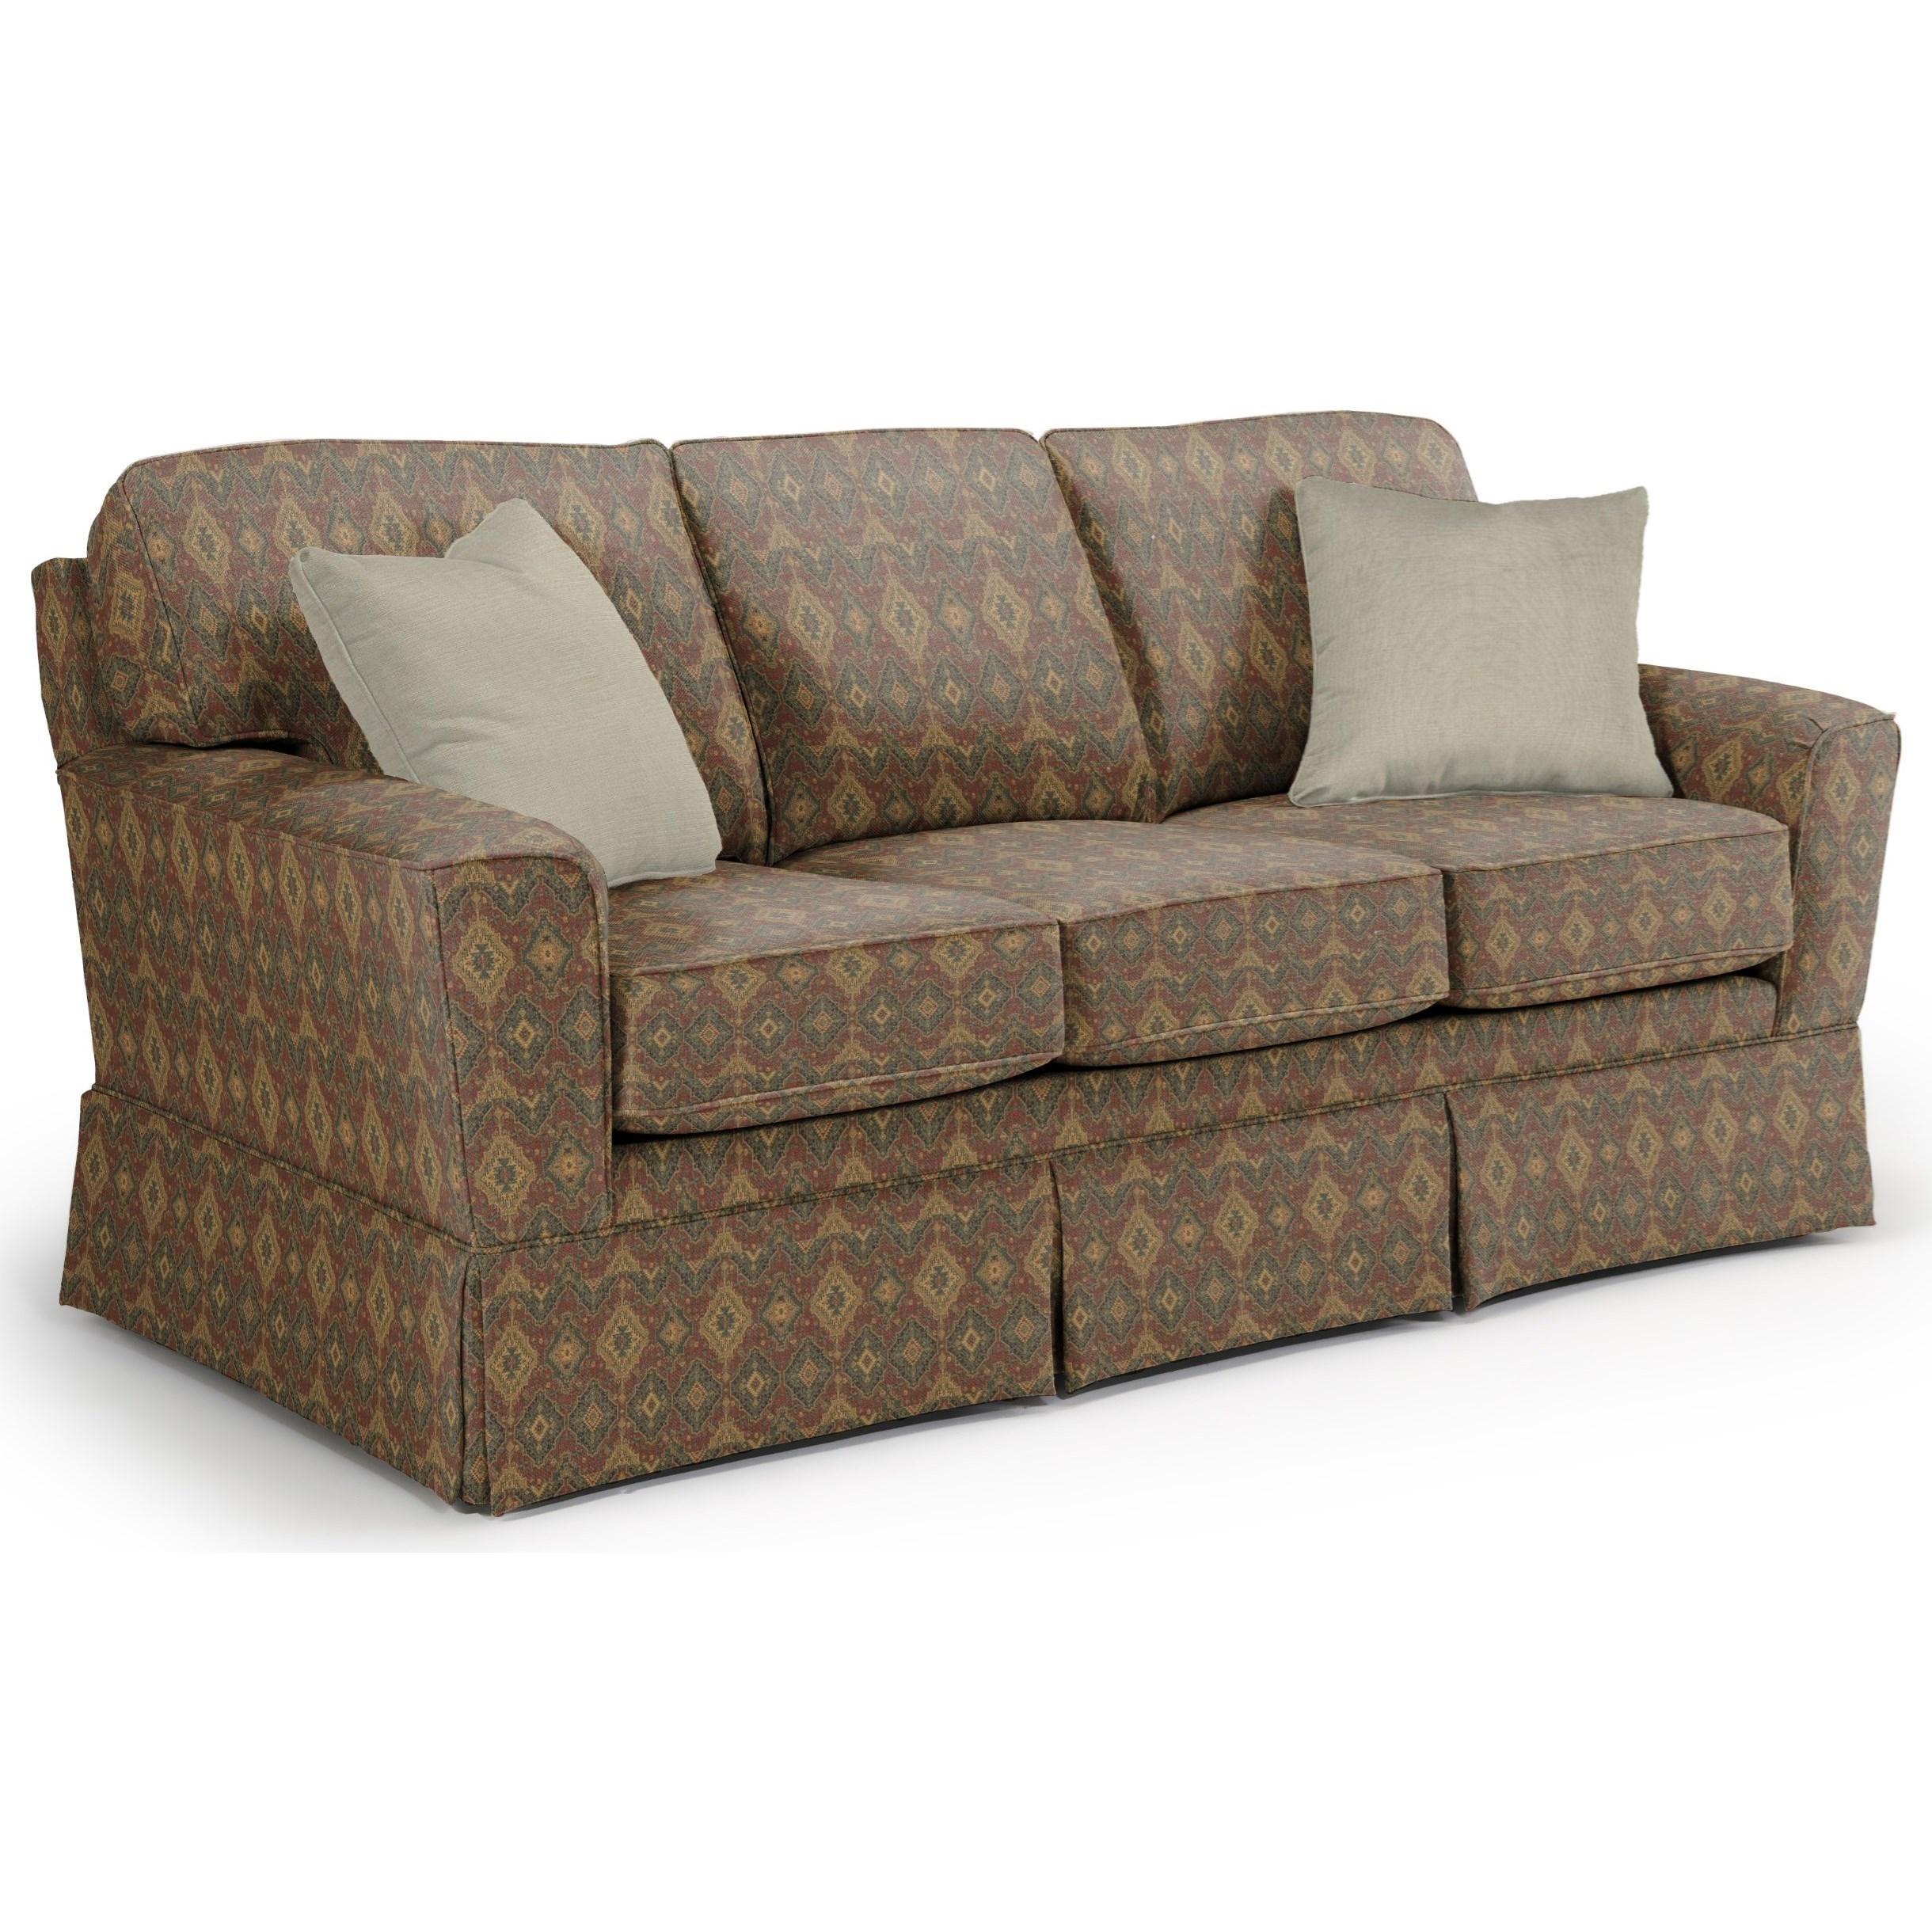 Best Home Furnishings Annabel  <b>Custom</b> 3 Over 3 Sofa - Item Number: -2110035674-20061